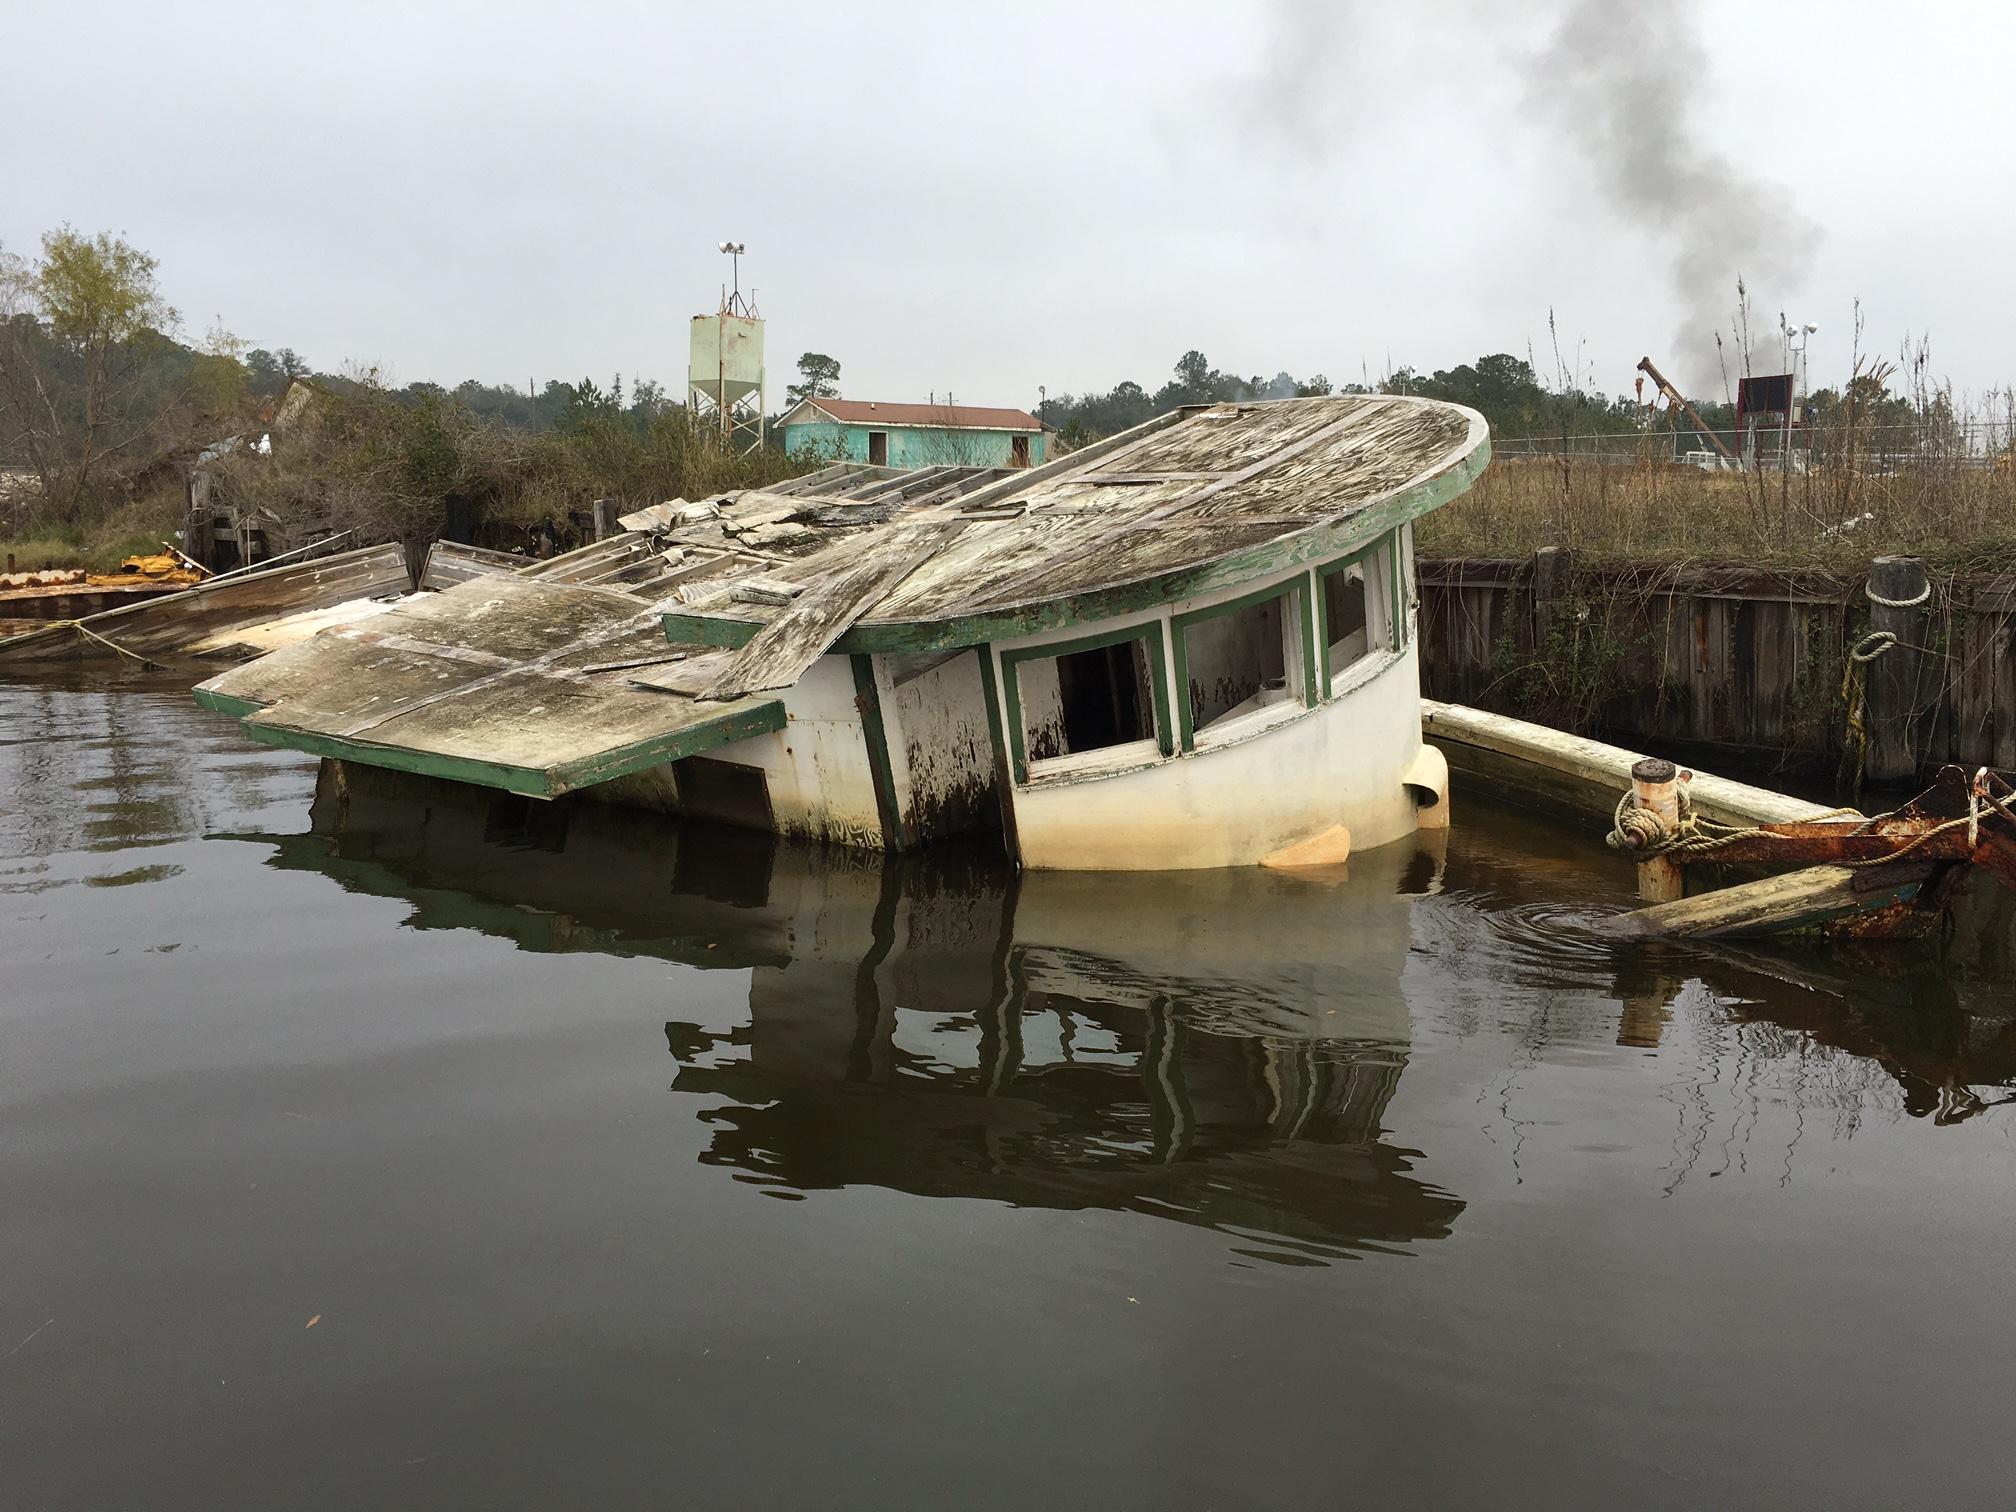 sunken shrimping boat next to port